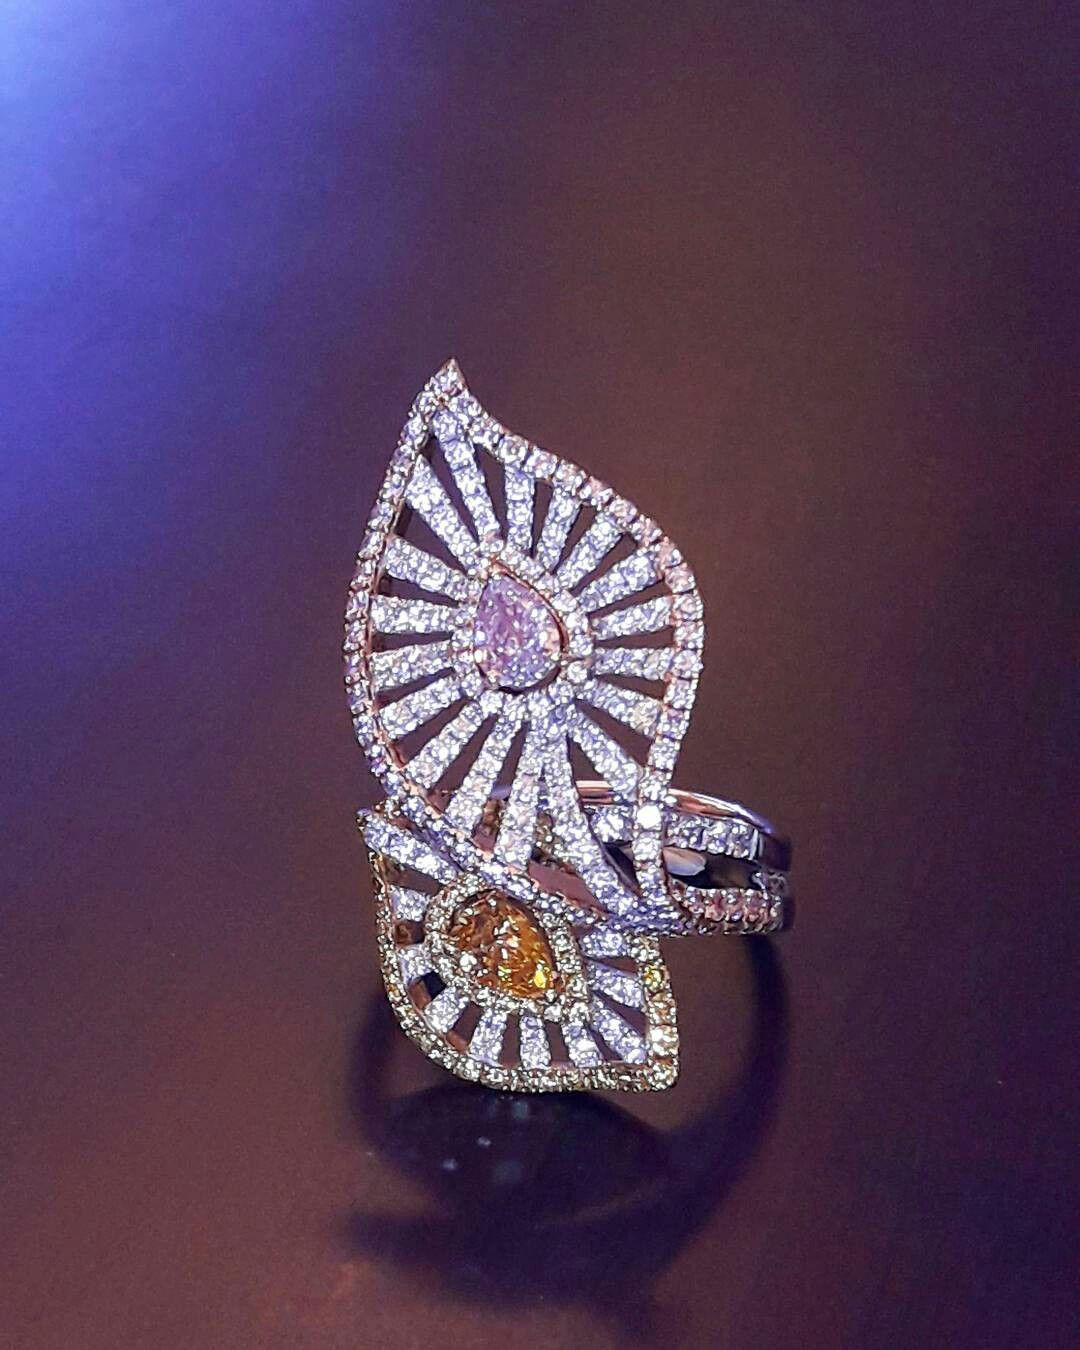 pinkdiamond #heart #diamond #colordiamond #ring @primagems_official